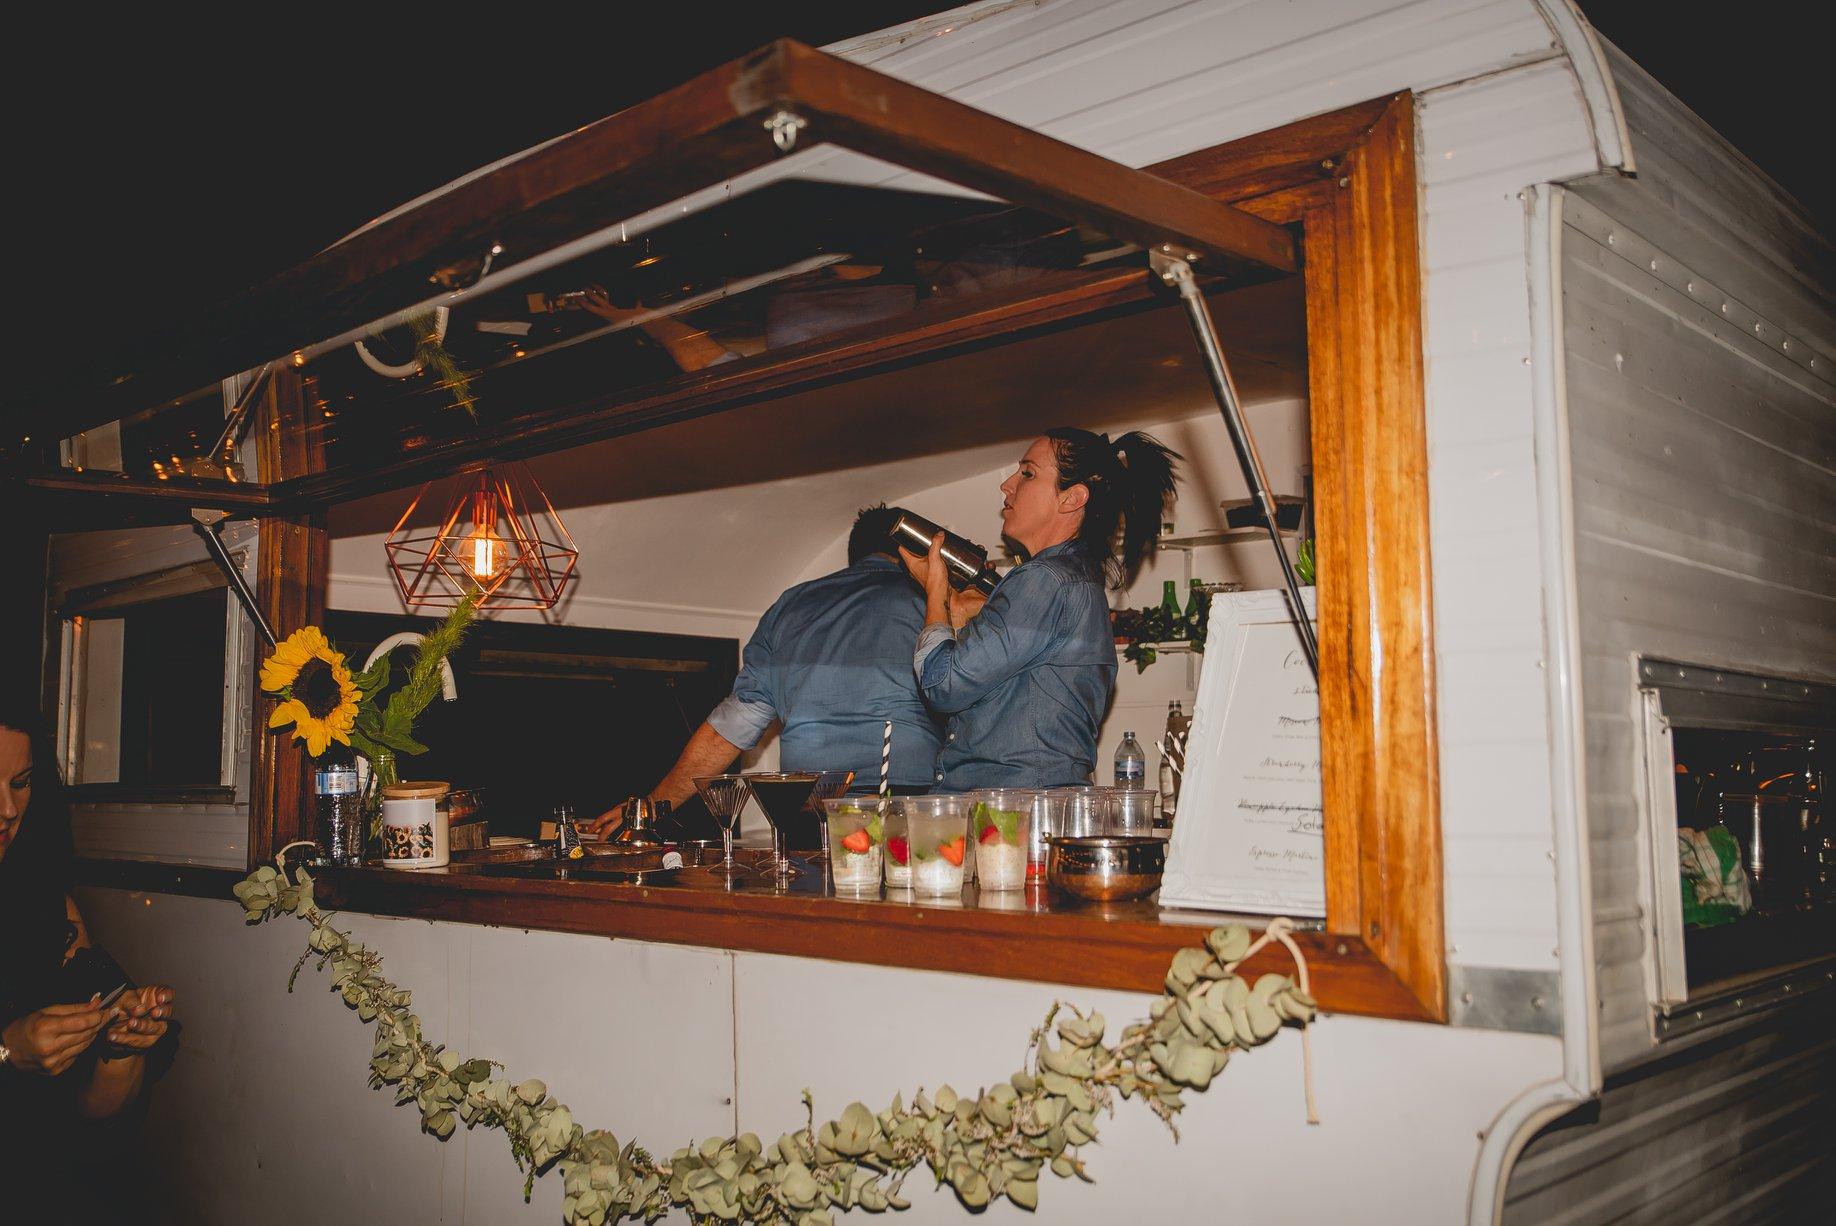 brisbane-charity-event-caravan-bar